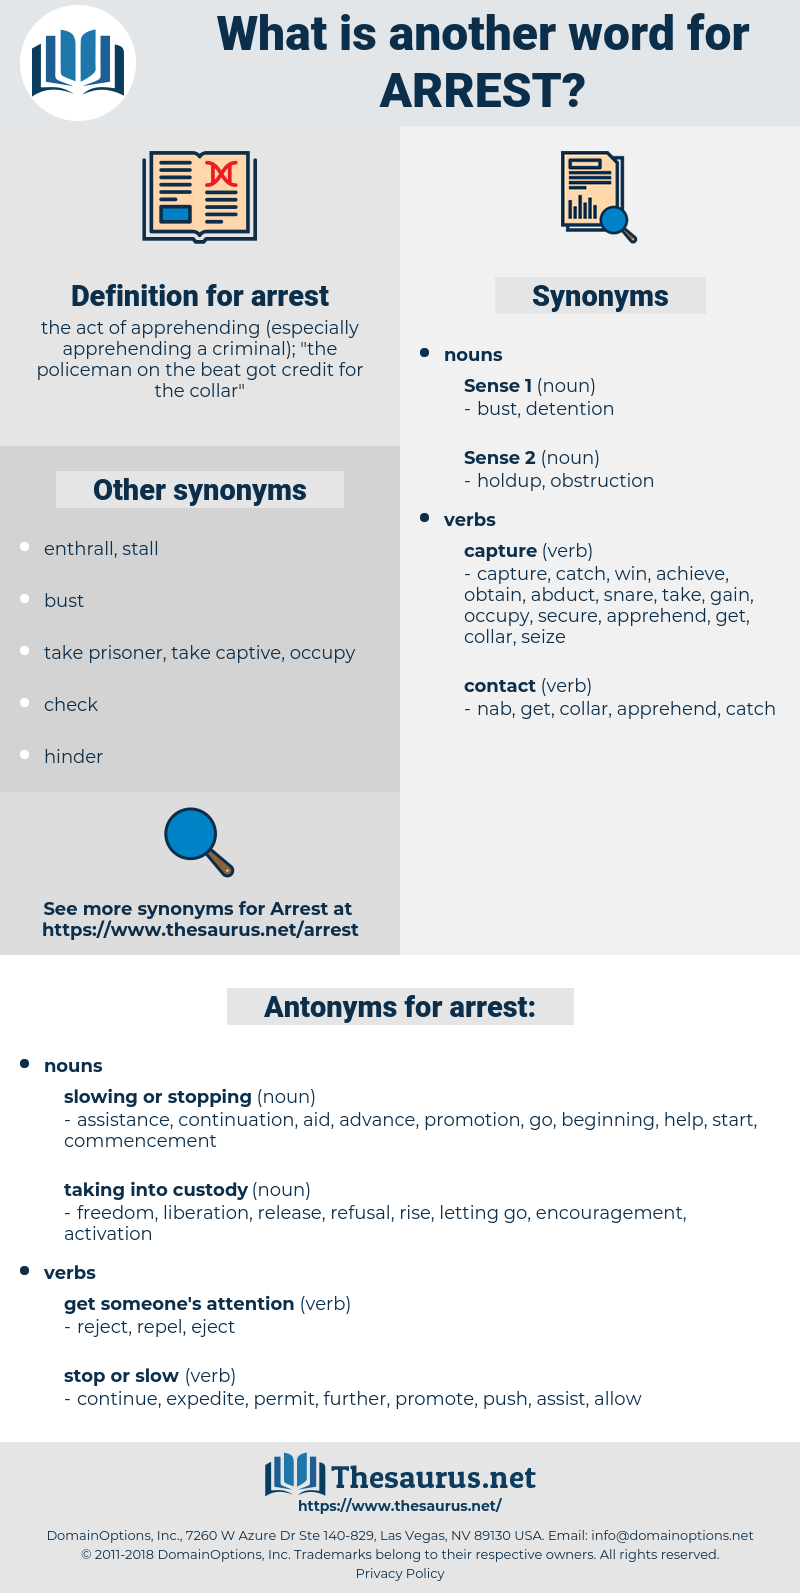 arrest, synonym arrest, another word for arrest, words like arrest, thesaurus arrest